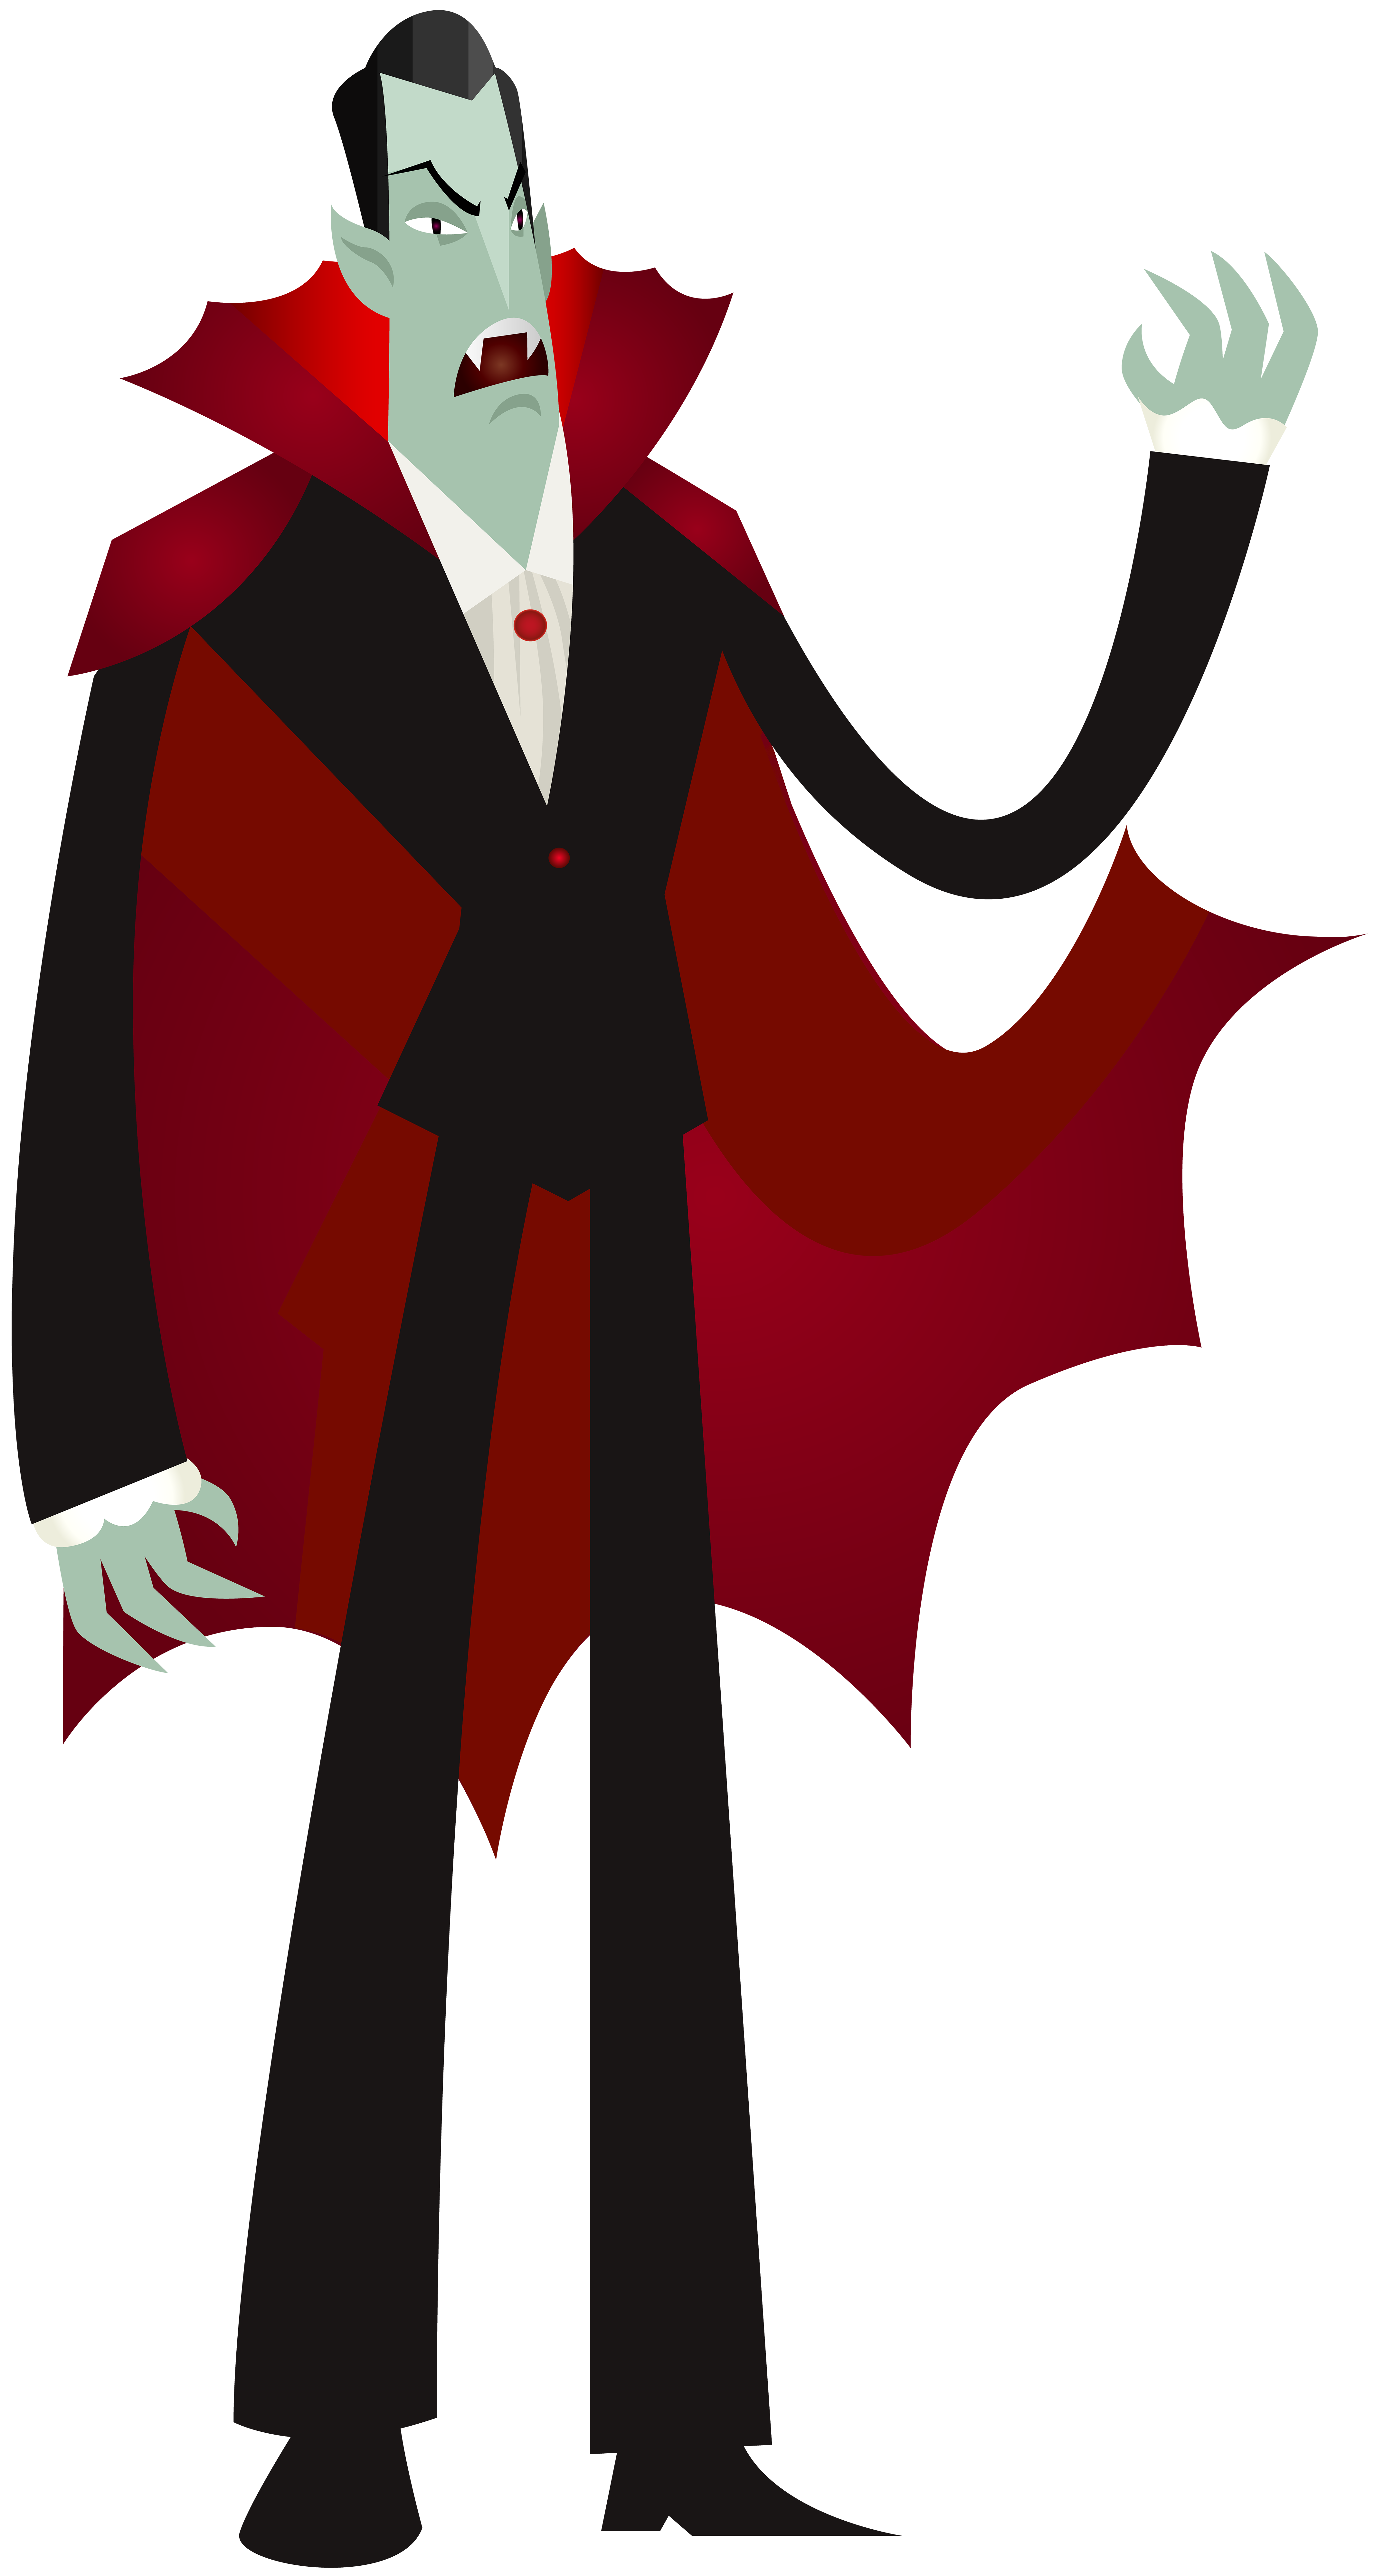 image free Vampire transparent. Png clip art image